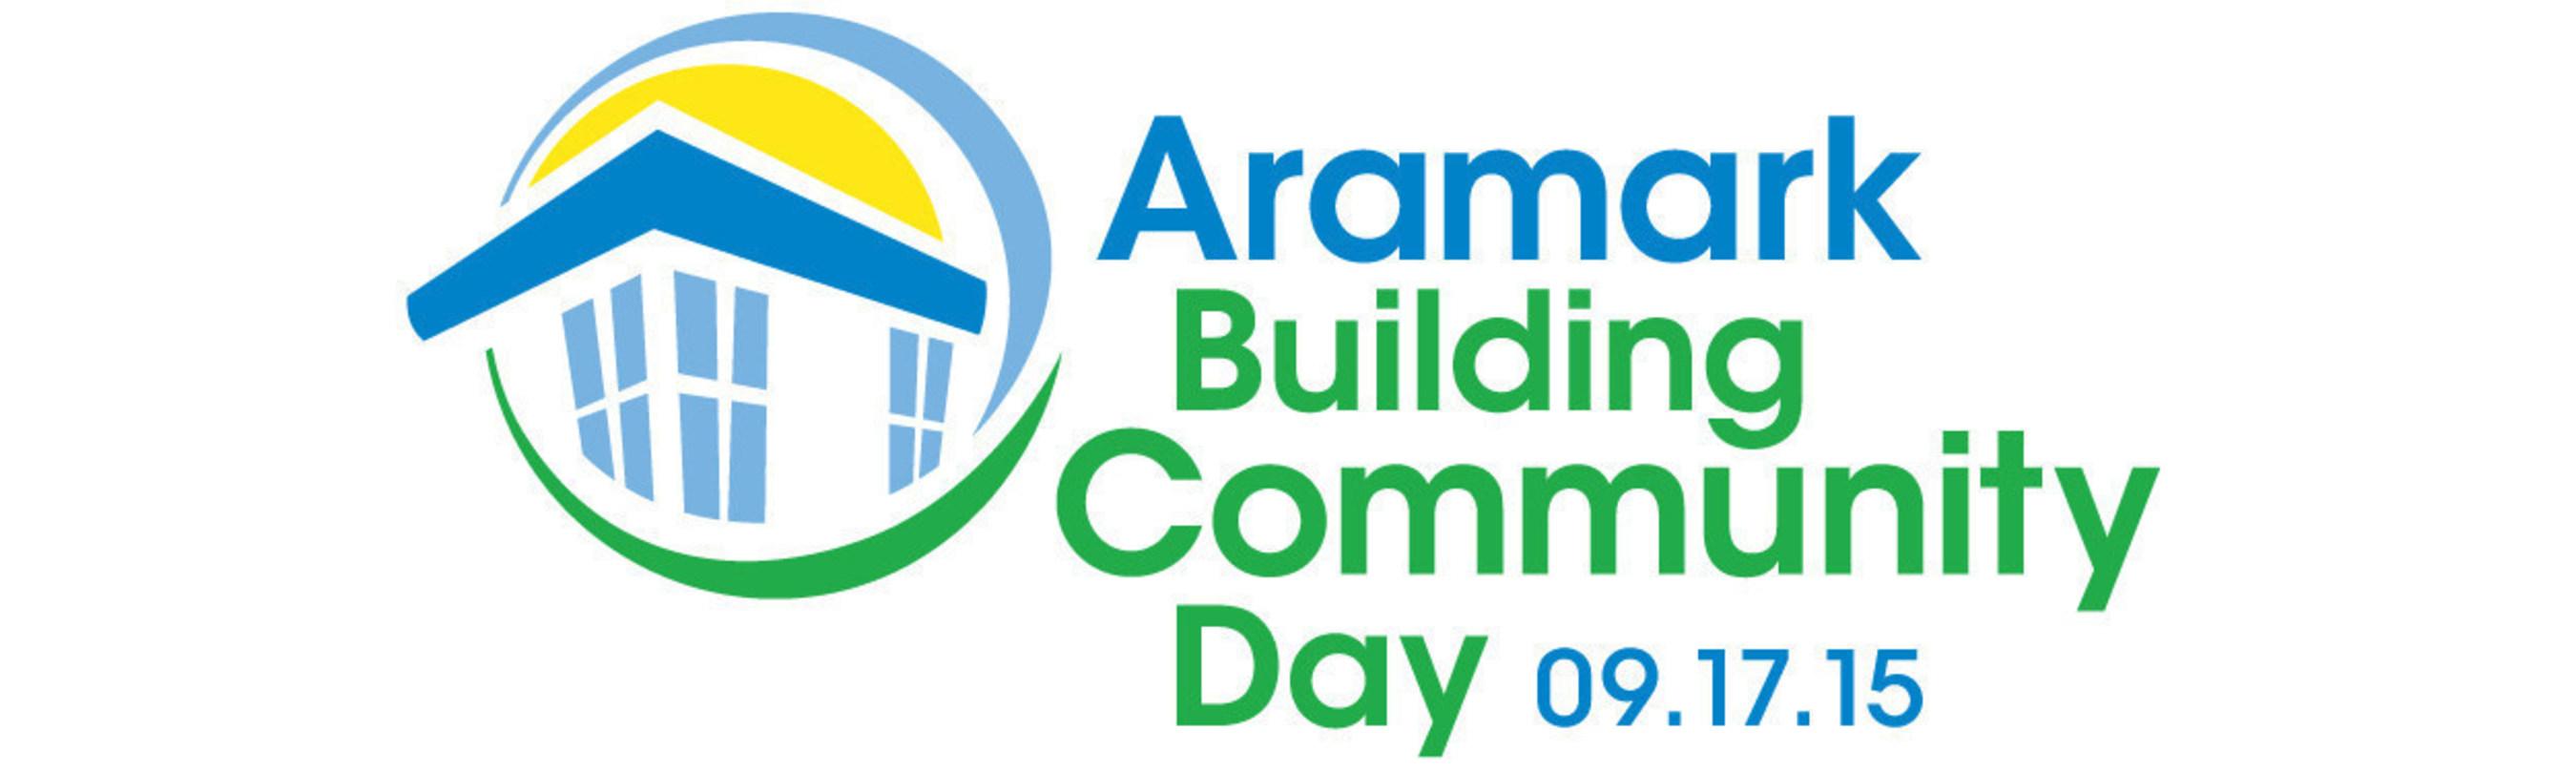 Aramark Building Community Day logo